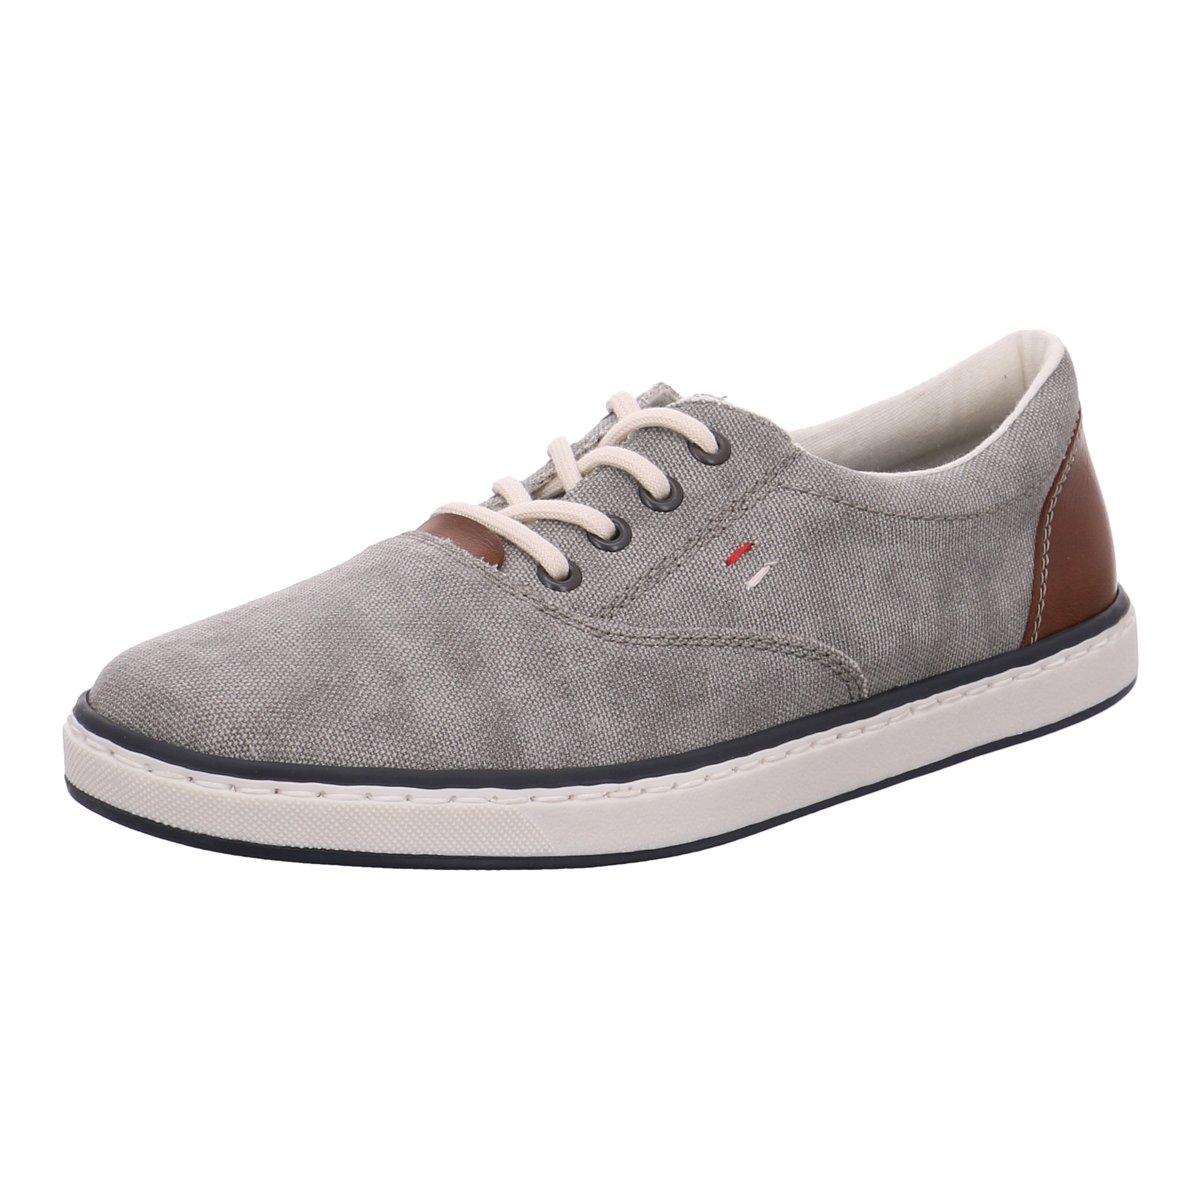 NEU Rieker Herren Sneaker 19650-40 grau 262140